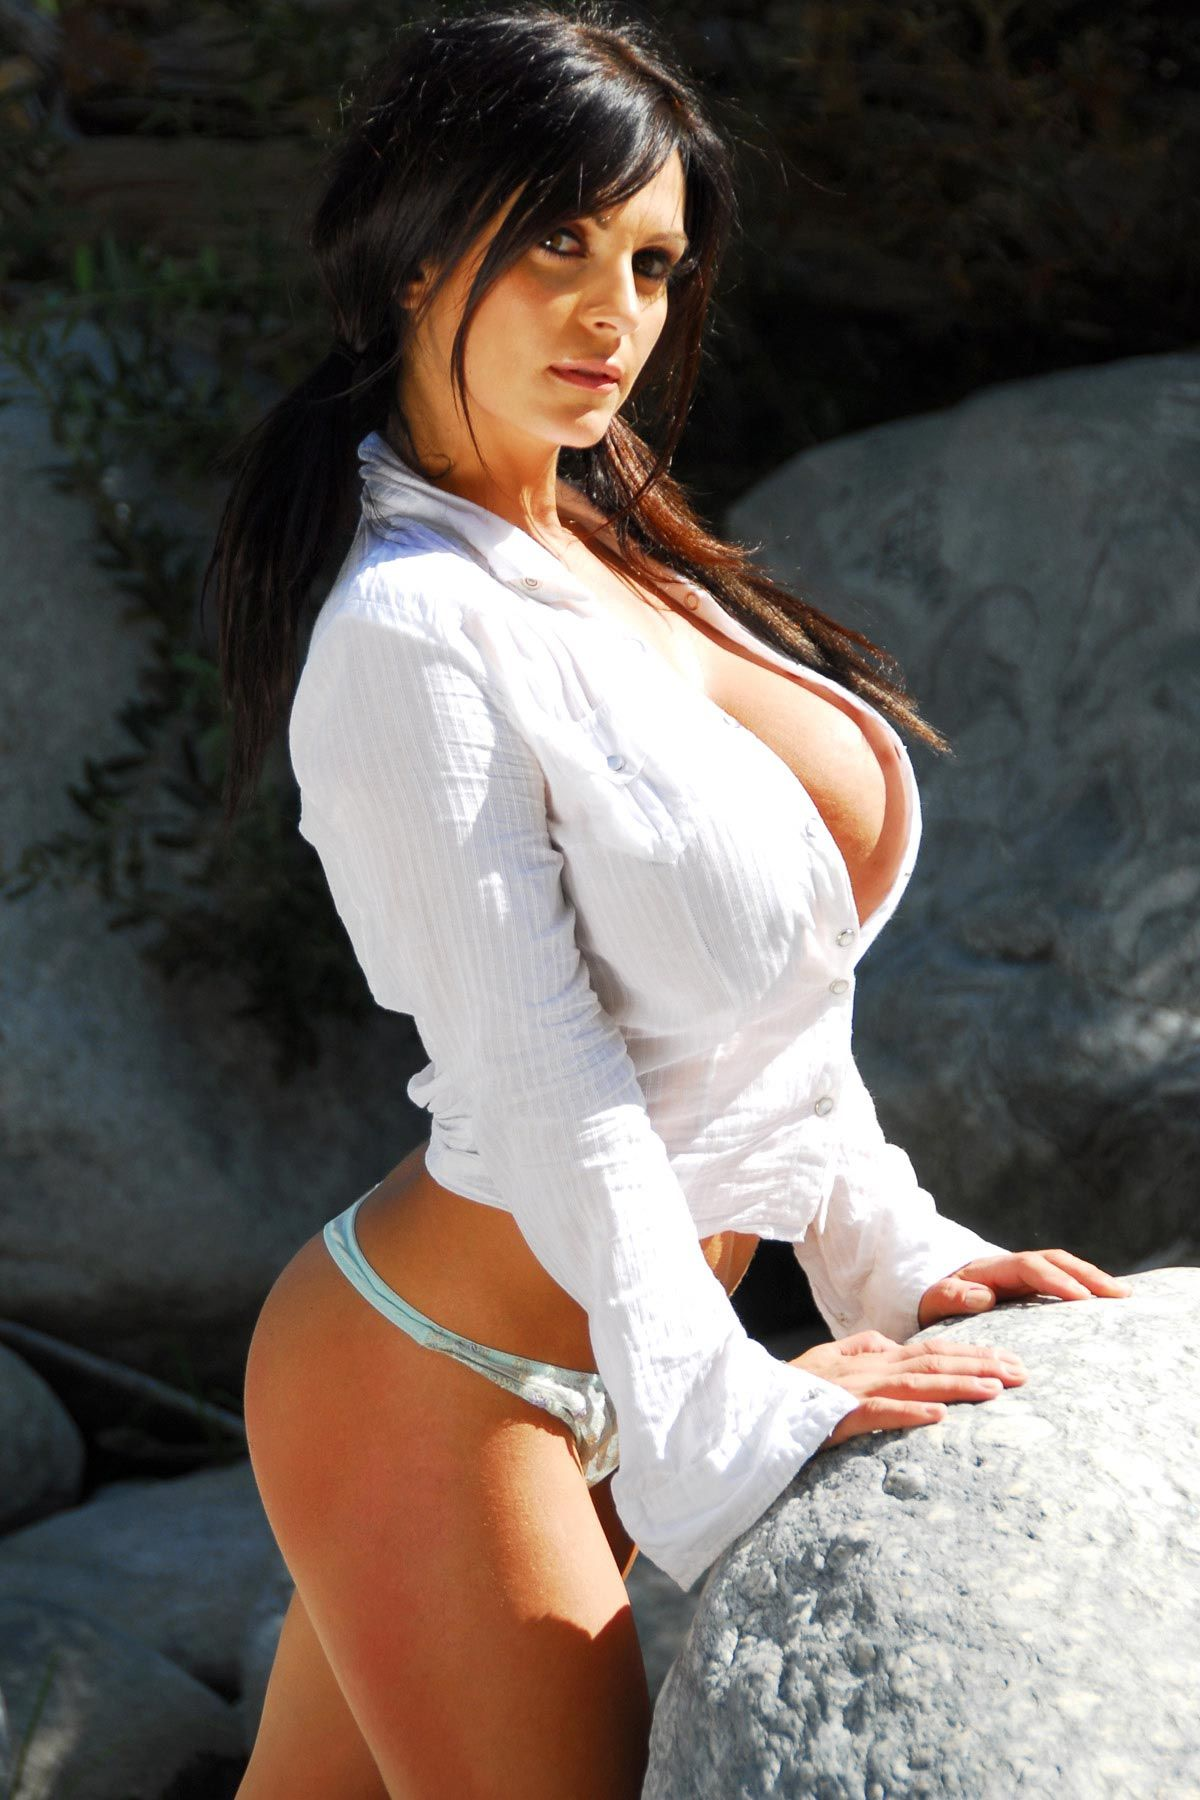 Olivia longott pussy pic